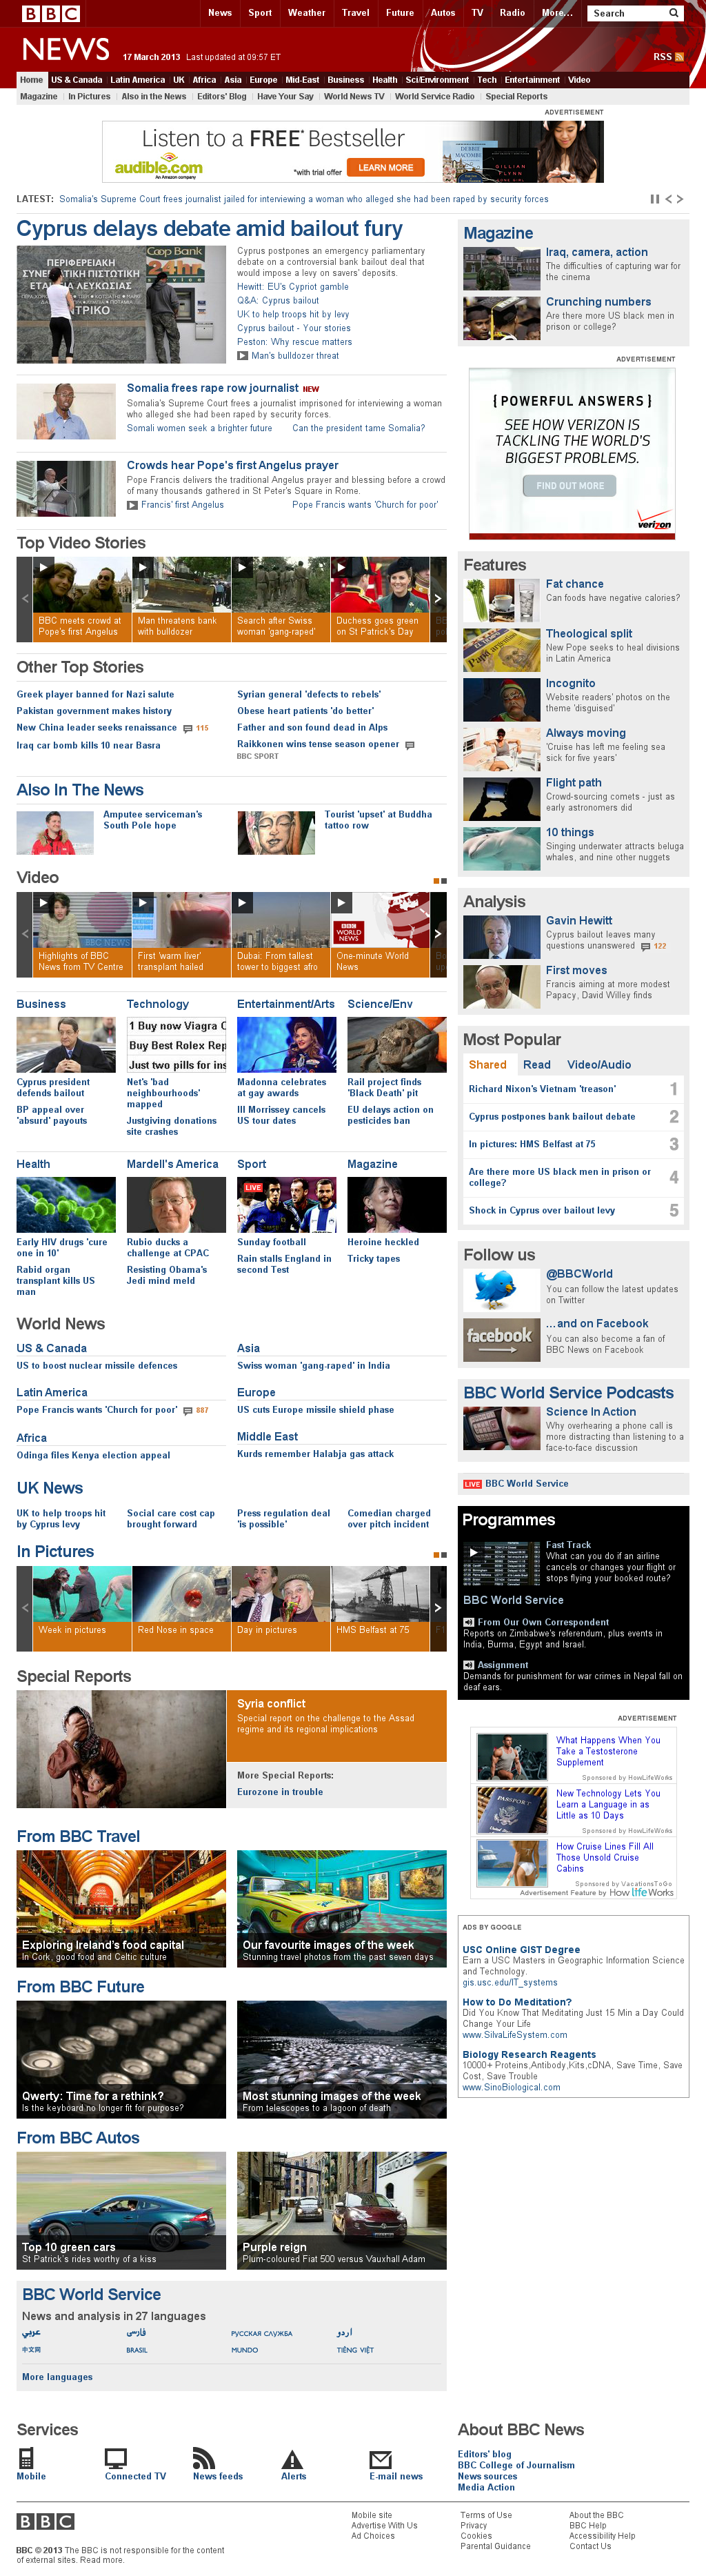 BBC at Sunday March 17, 2013, 2:02 p.m. UTC